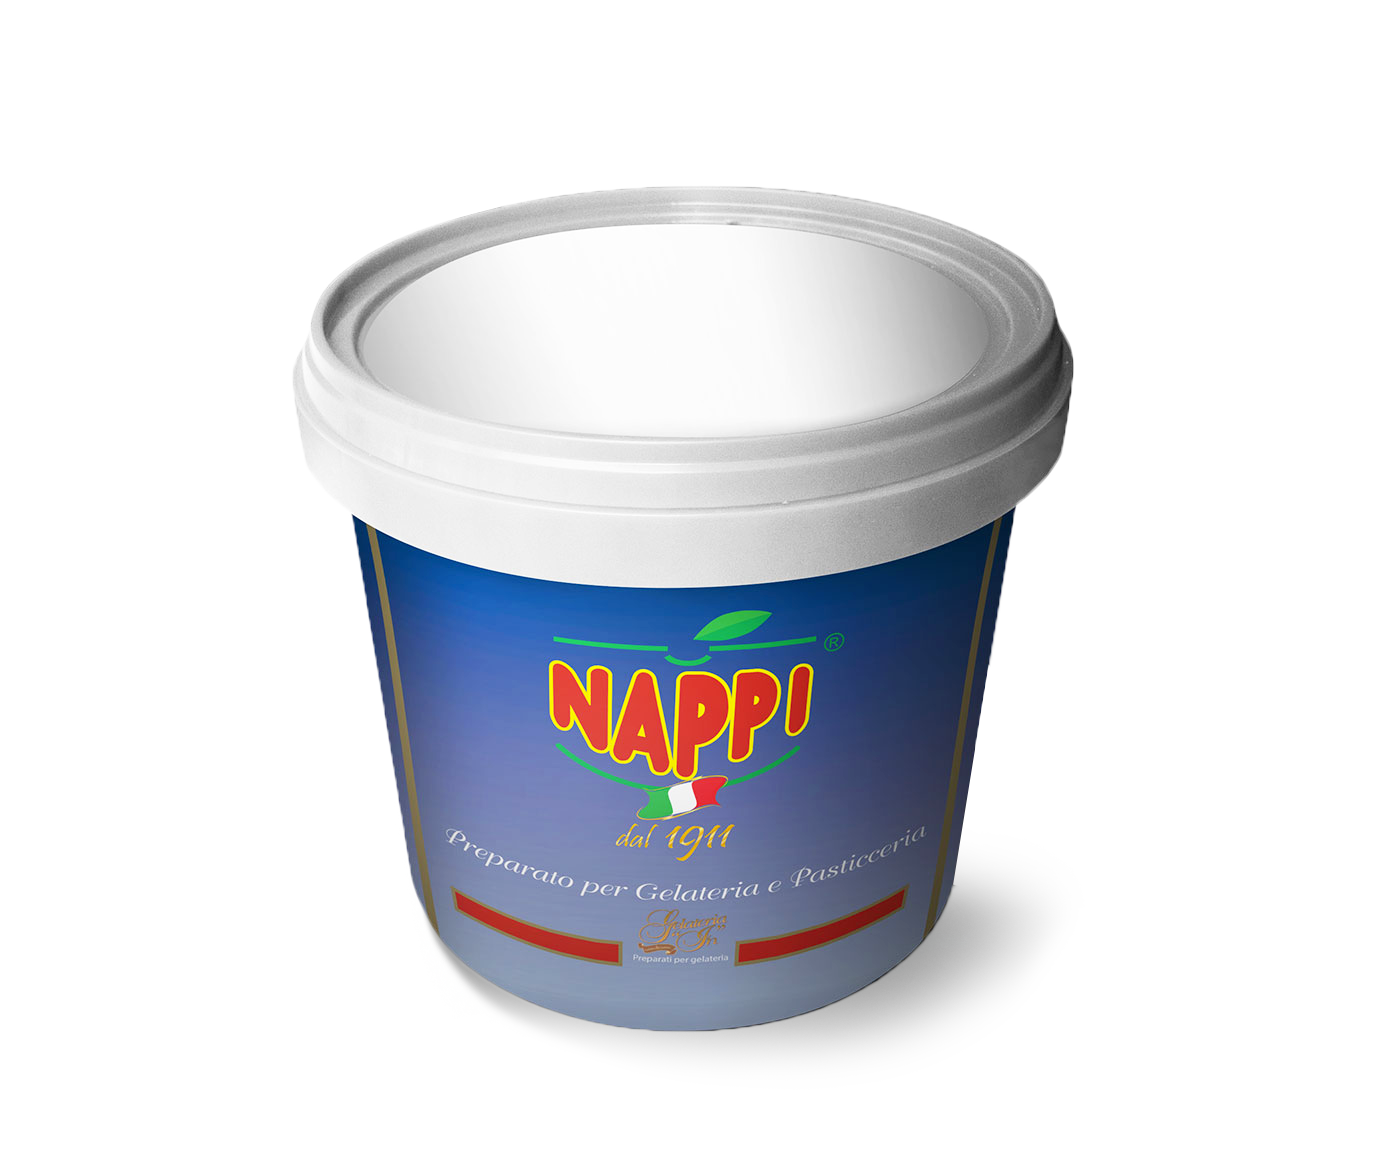 Nappi Mango 3.5kg pail